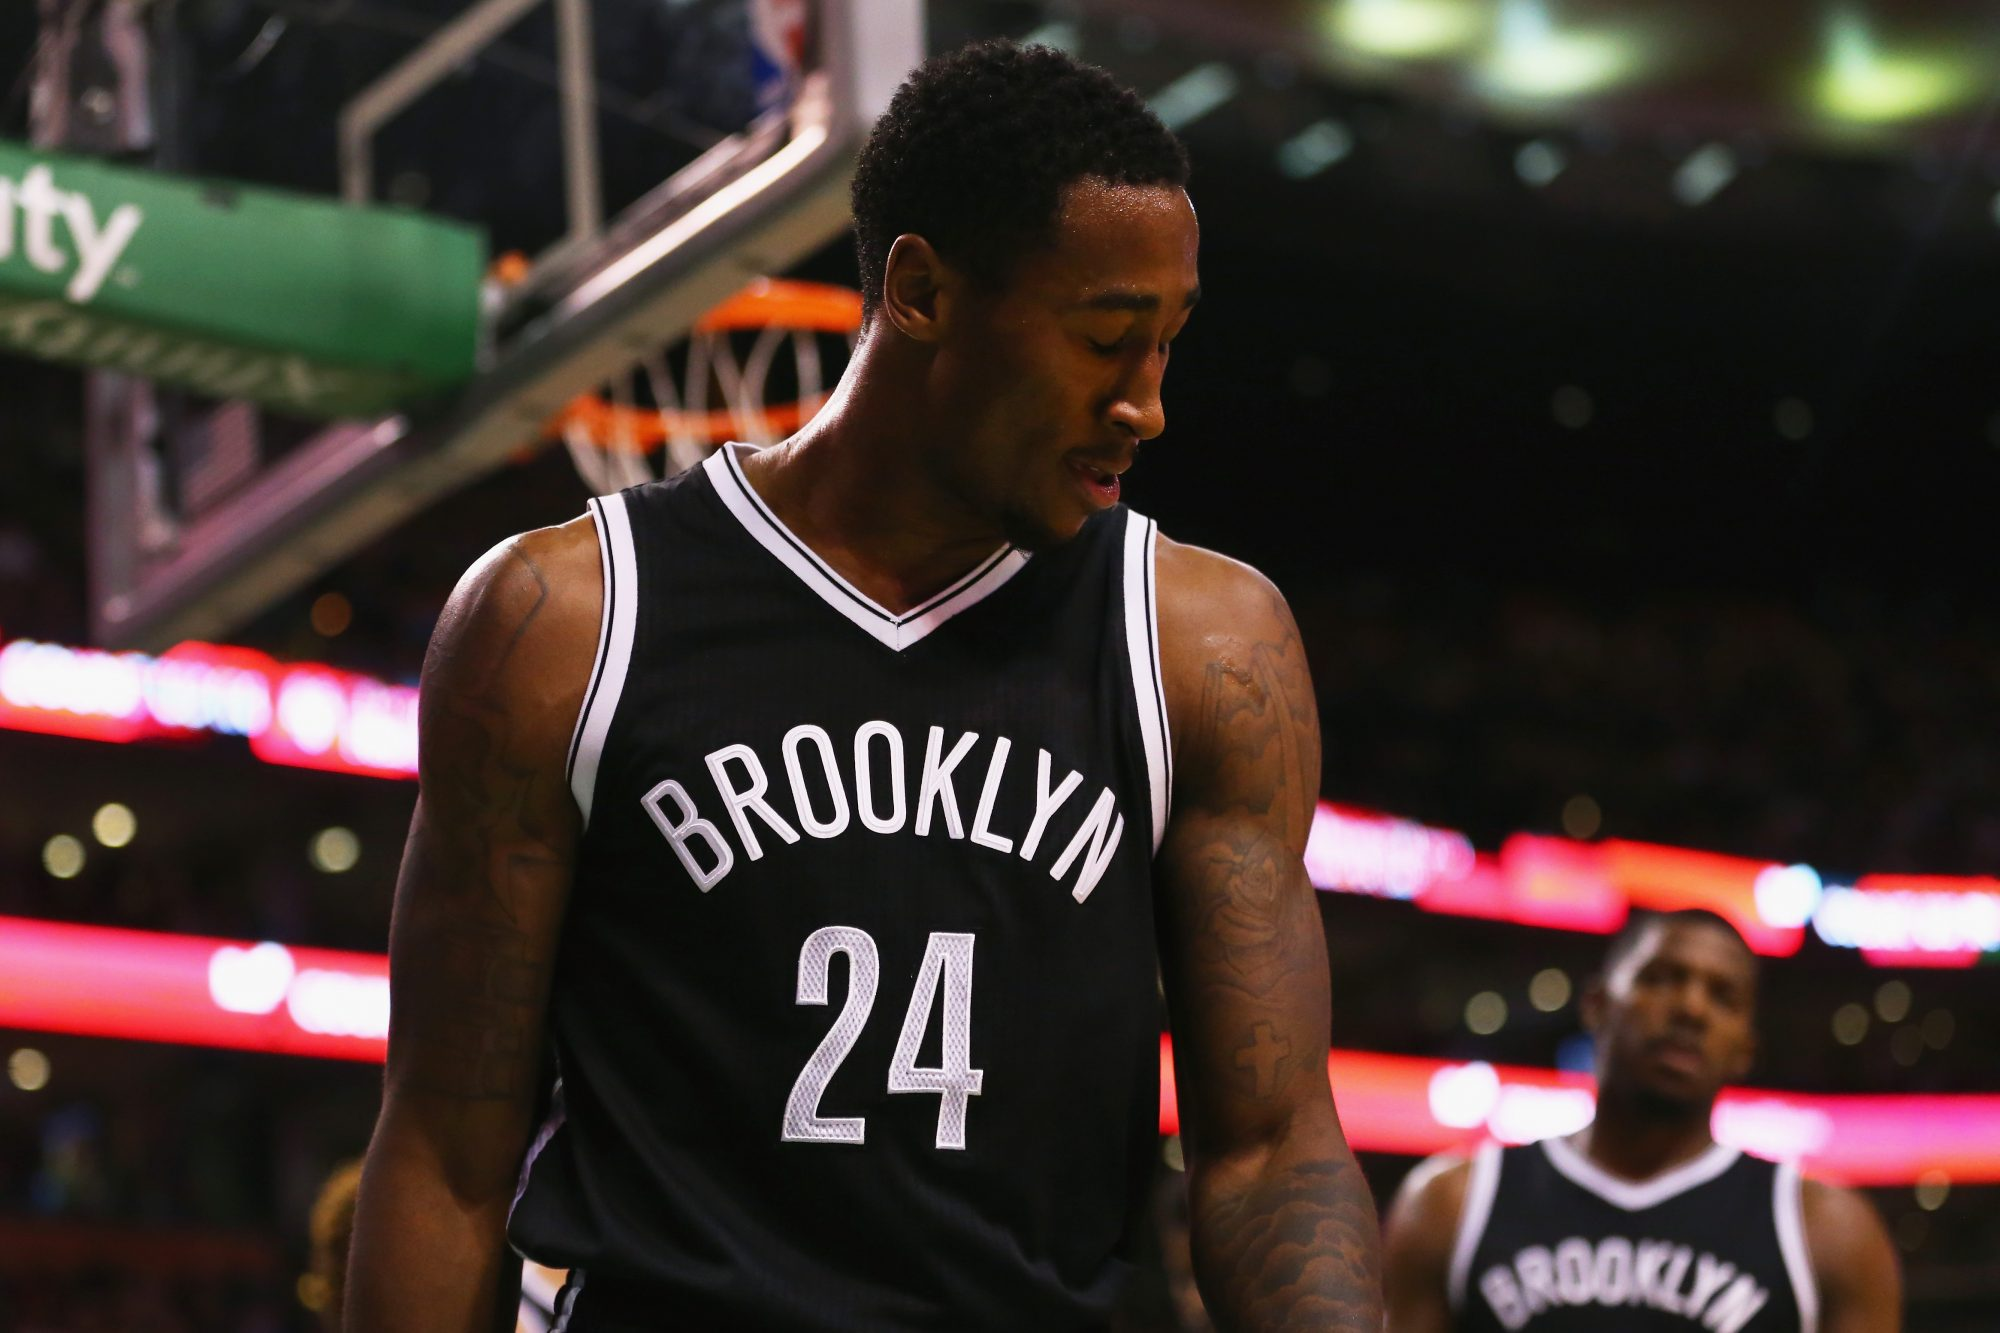 Brooklyn Nets: Projecting Rondae Hollis-Jefferson's 2017-18 Season 2